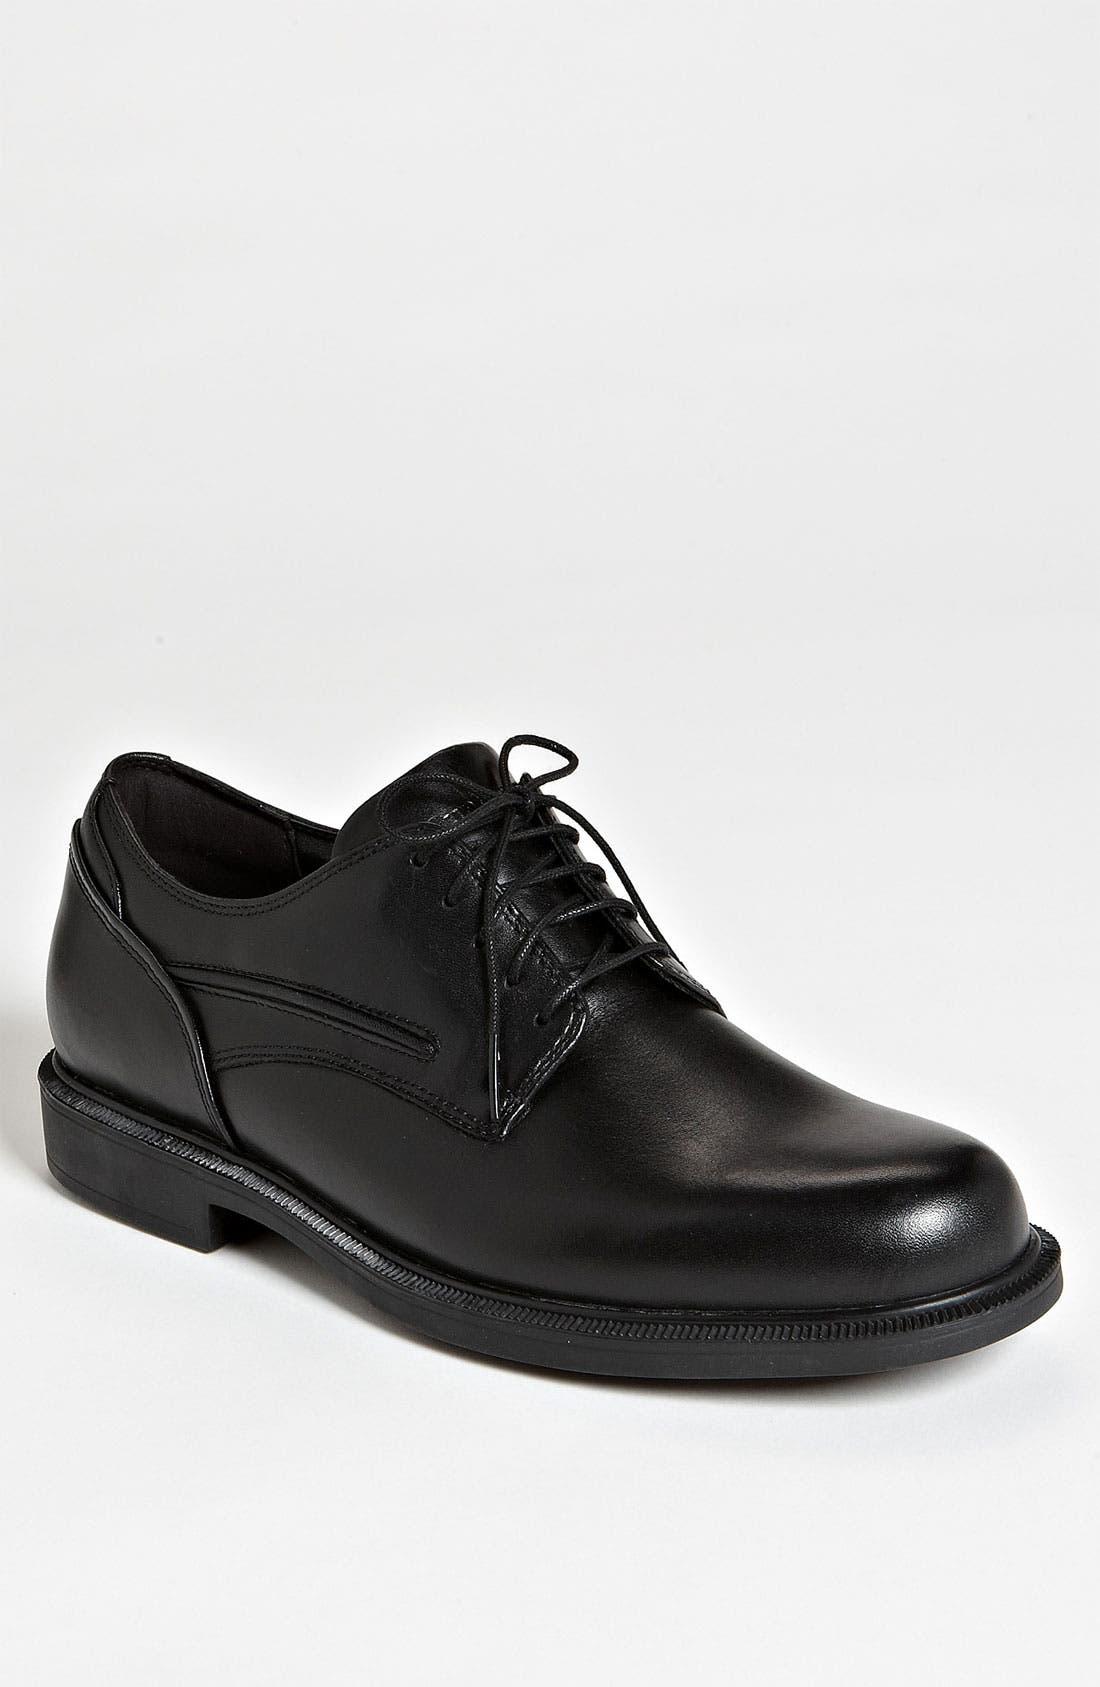 'Burlington' Oxford,                         Main,                         color, BLACK LEATHER